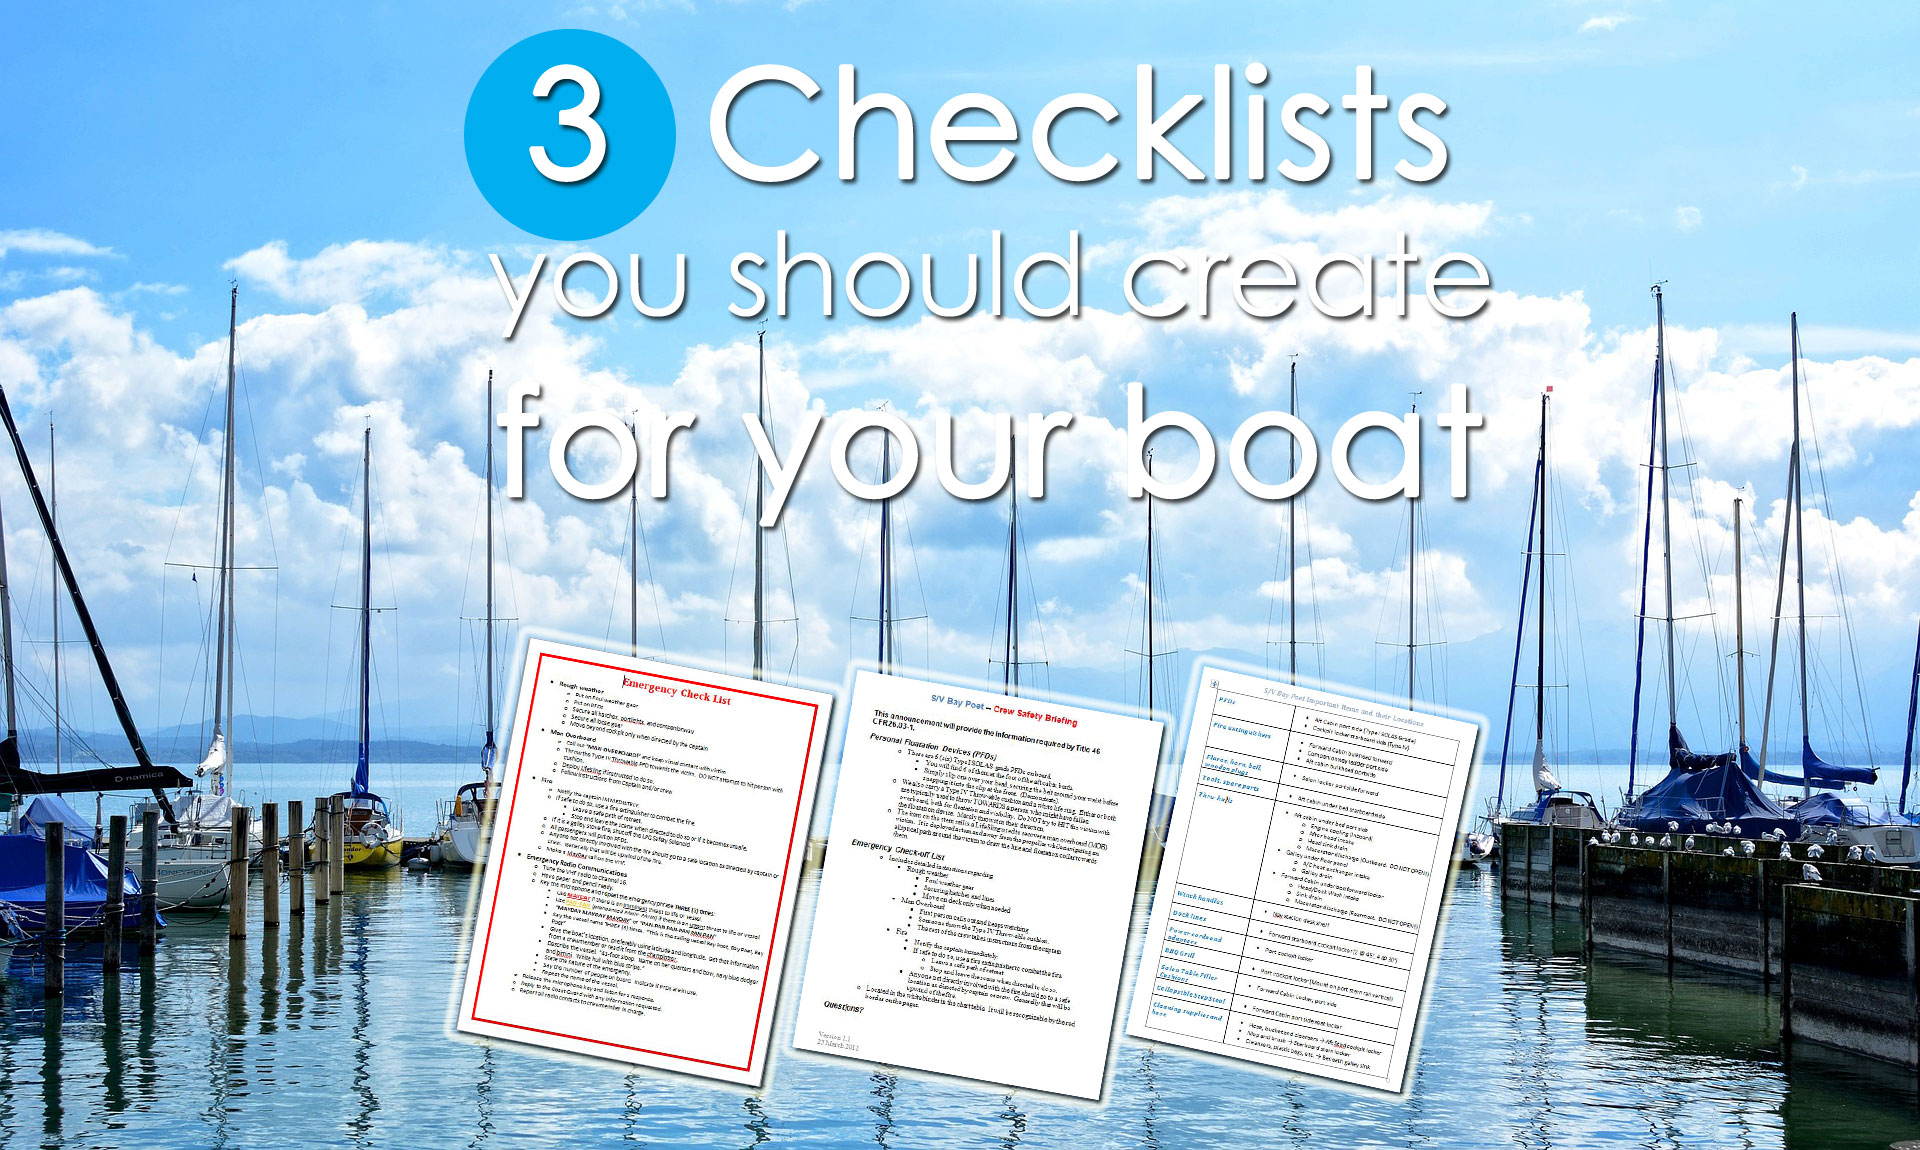 checklists boat